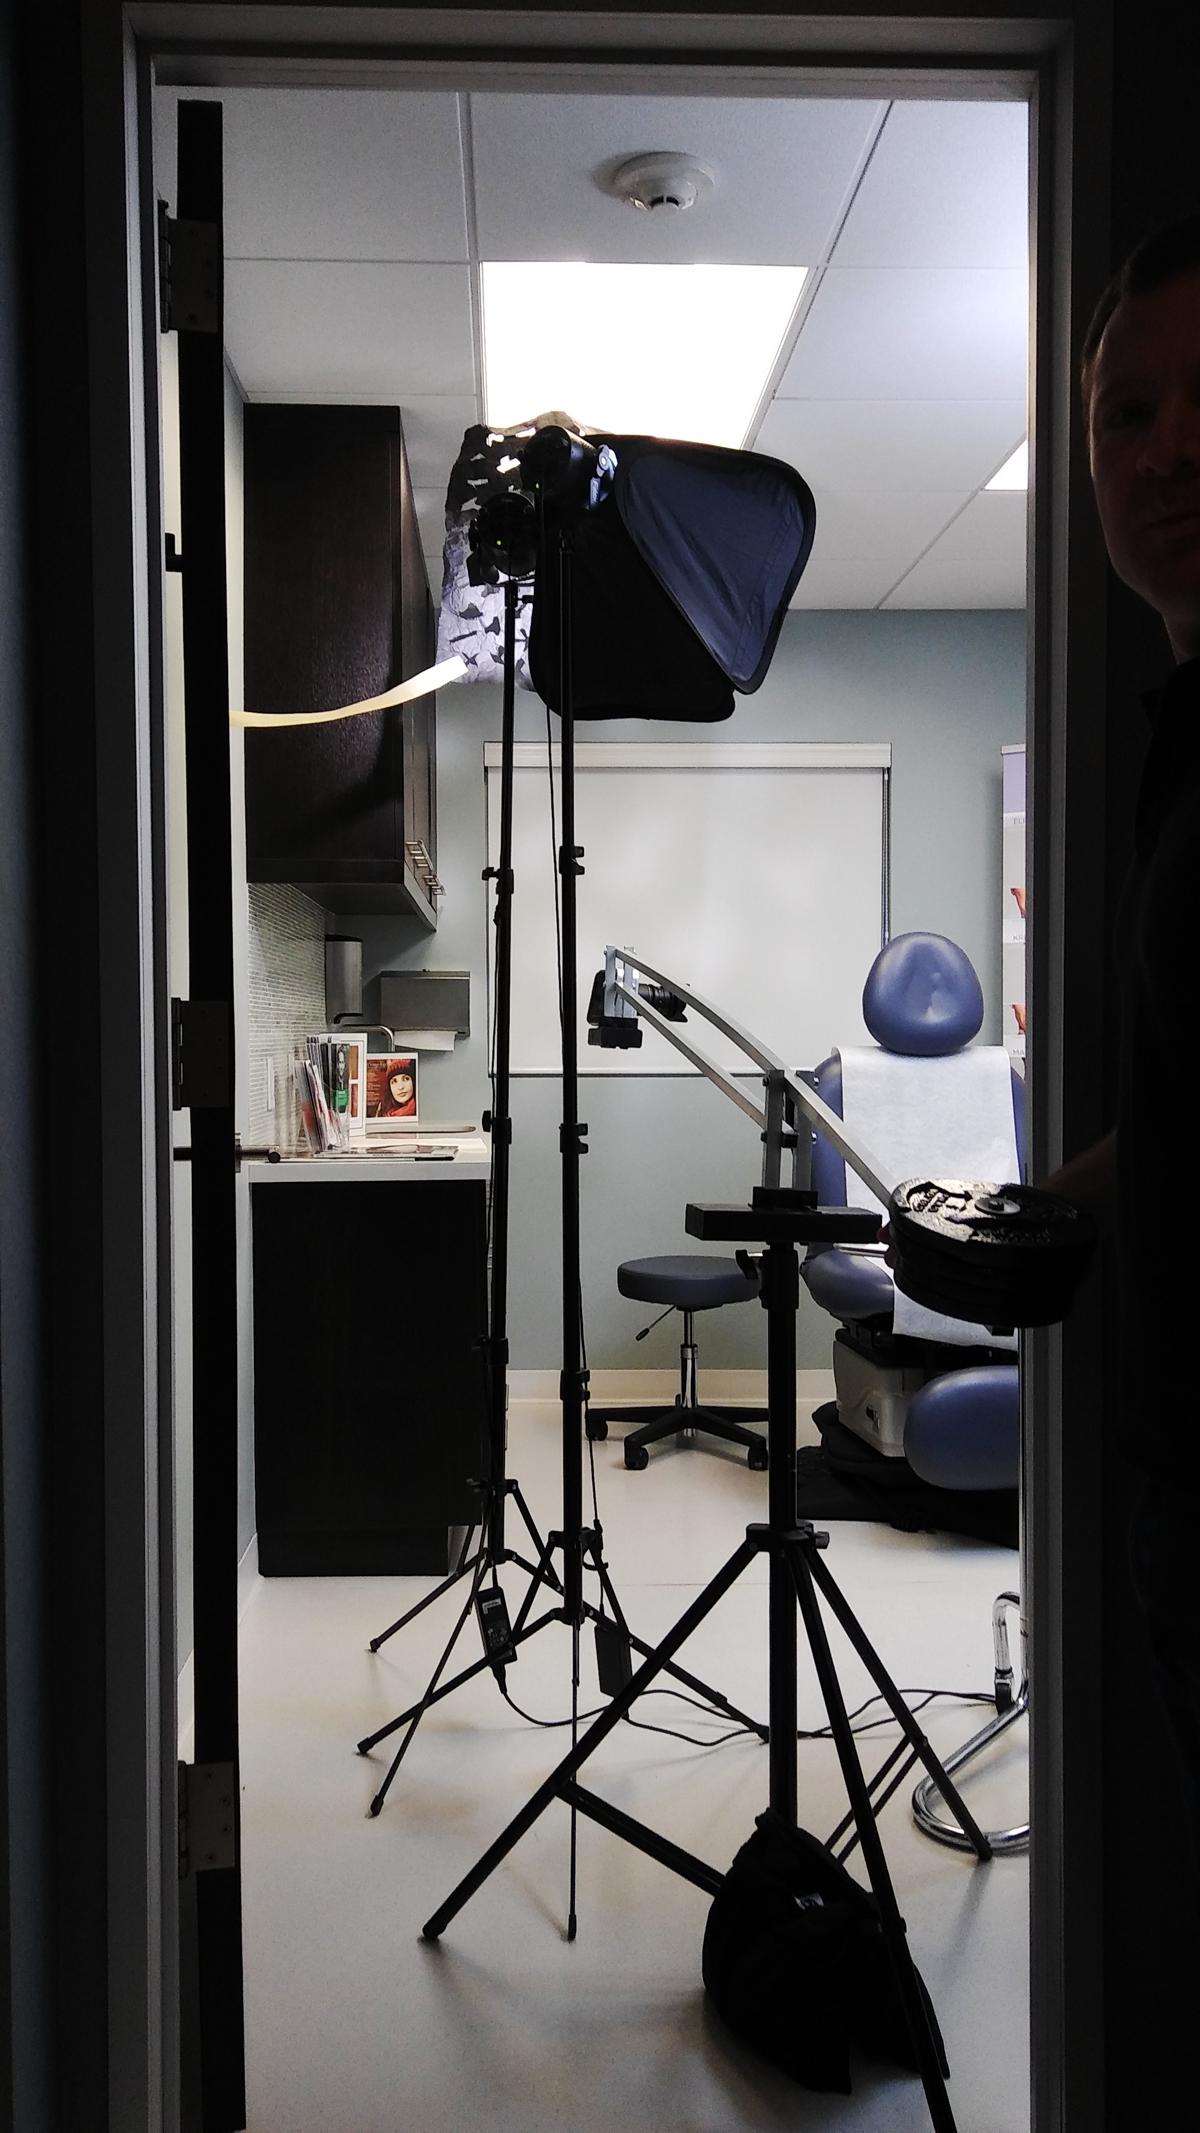 Sunset Dermatology promotional video filming day scene setup photo.